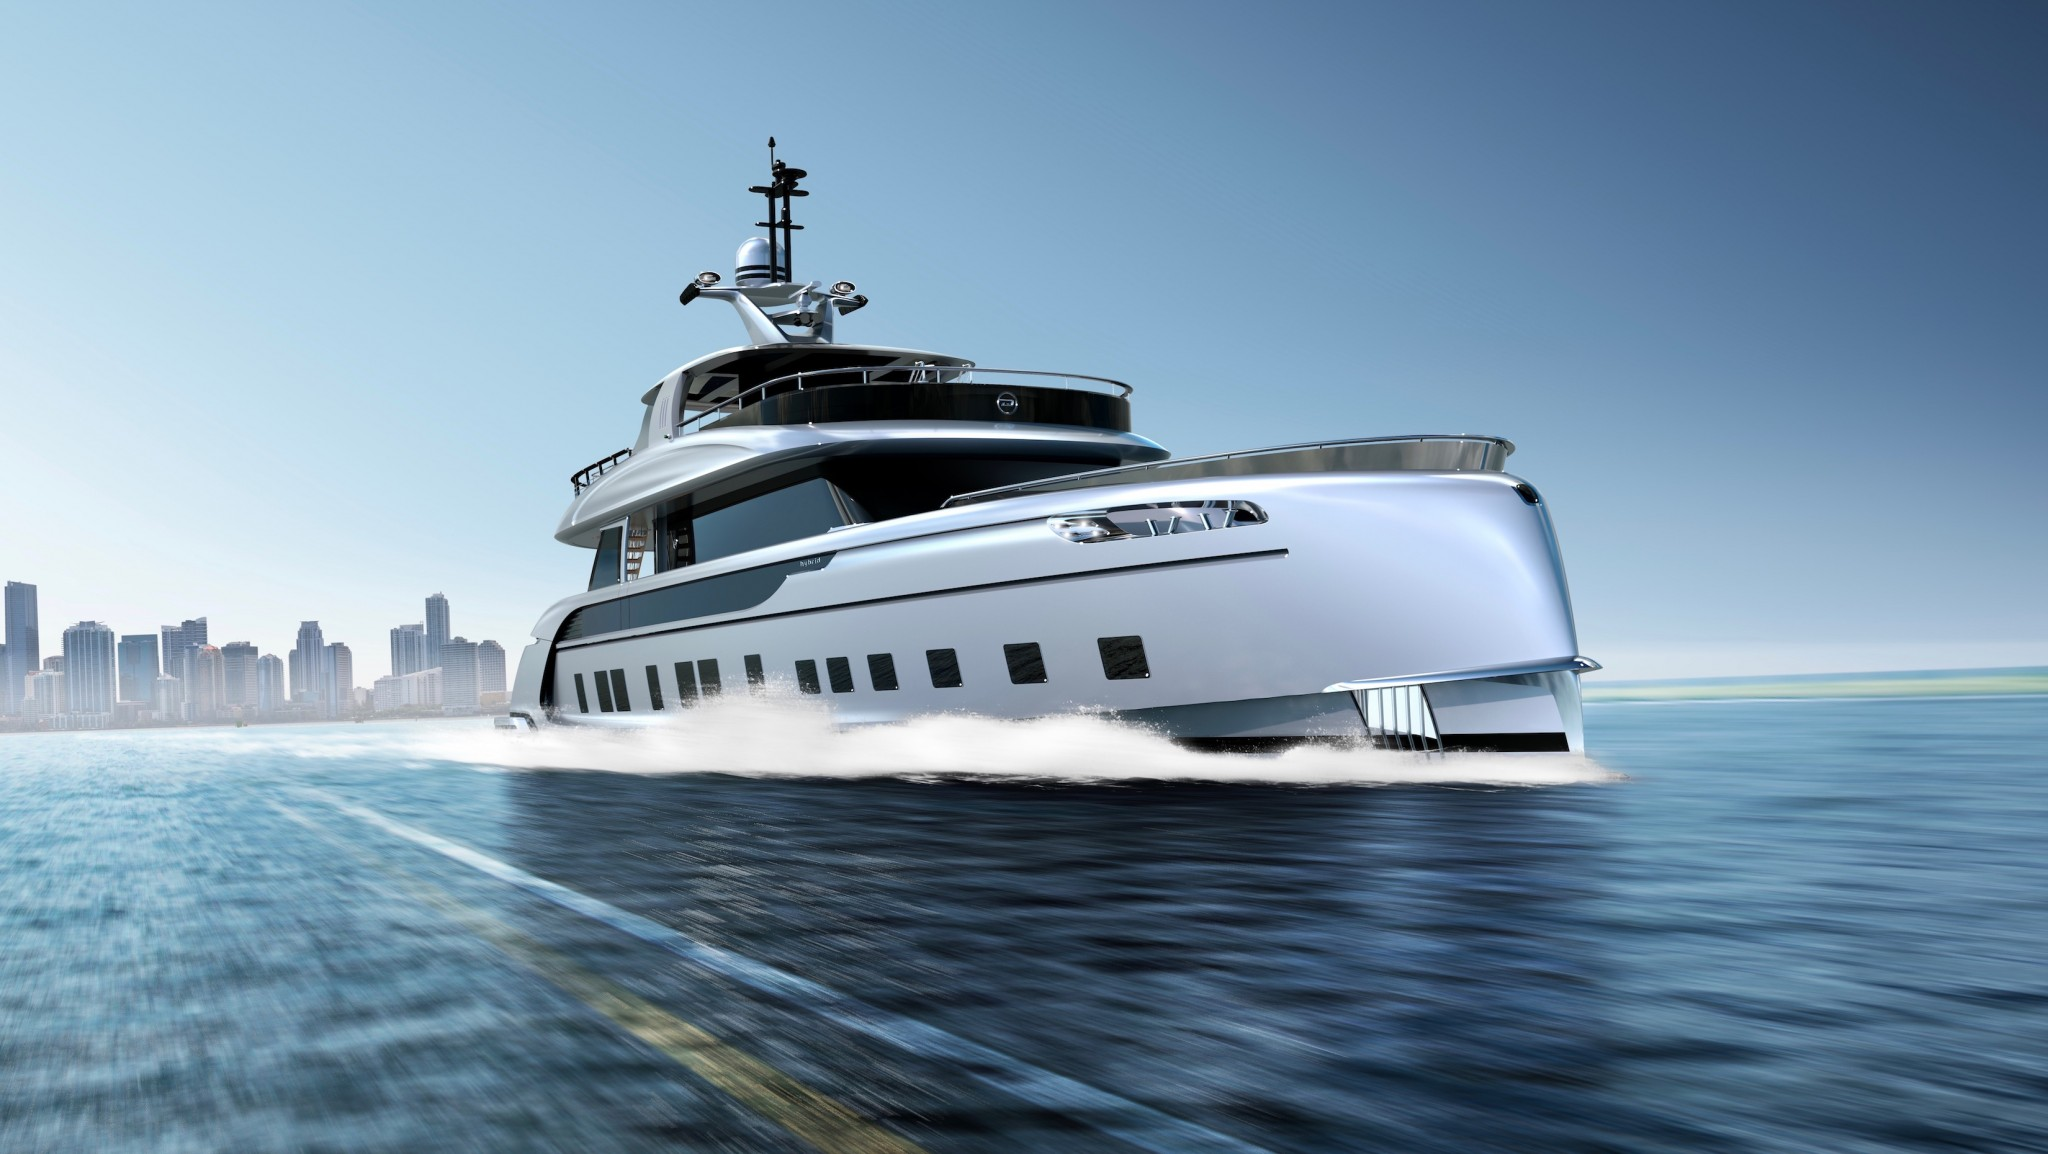 high_gtt_gran_turismo_transatlantic_115_hybrid_yacht_2017_porsche_ag (4)